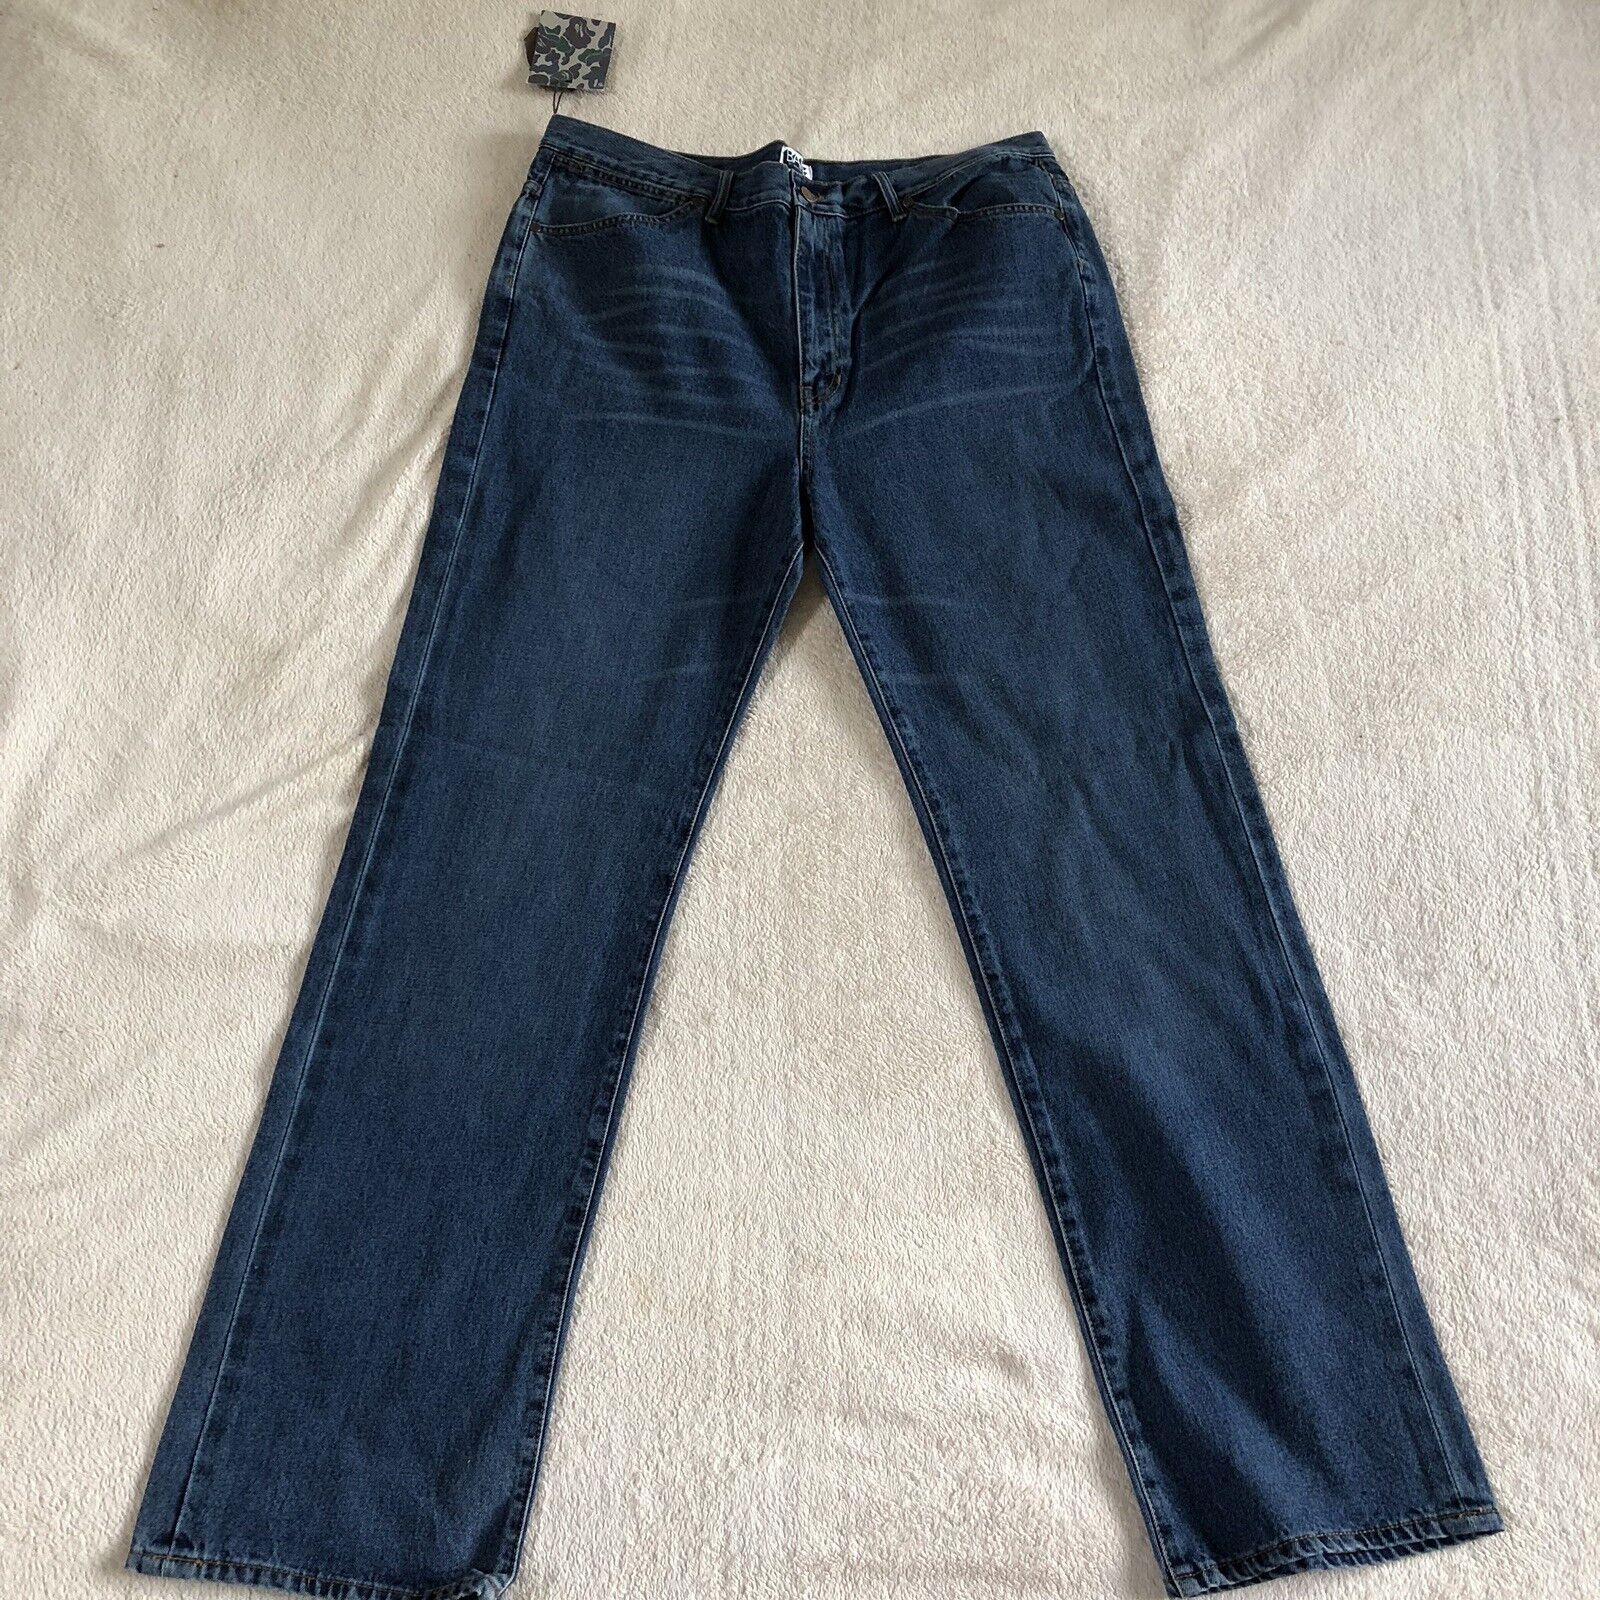 NWT A Bathing Ape Men's Jeans Size 3XL